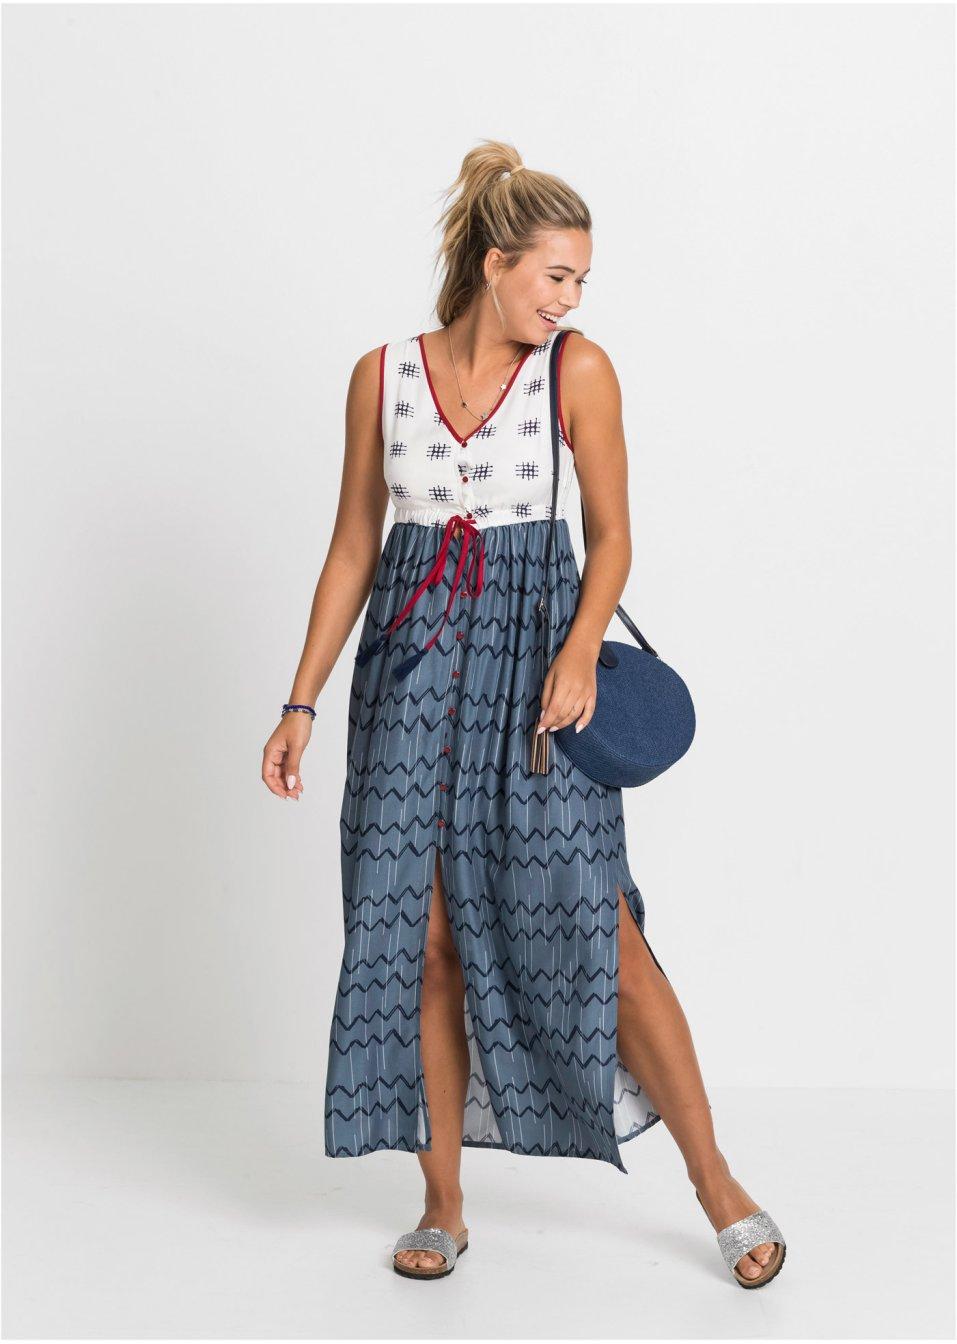 Mode Femme Vêtements DJLfdOFlkj Robe avec lien à nouer bleu fumée/bleu foncé/blanc à motif RAINBOW .fr